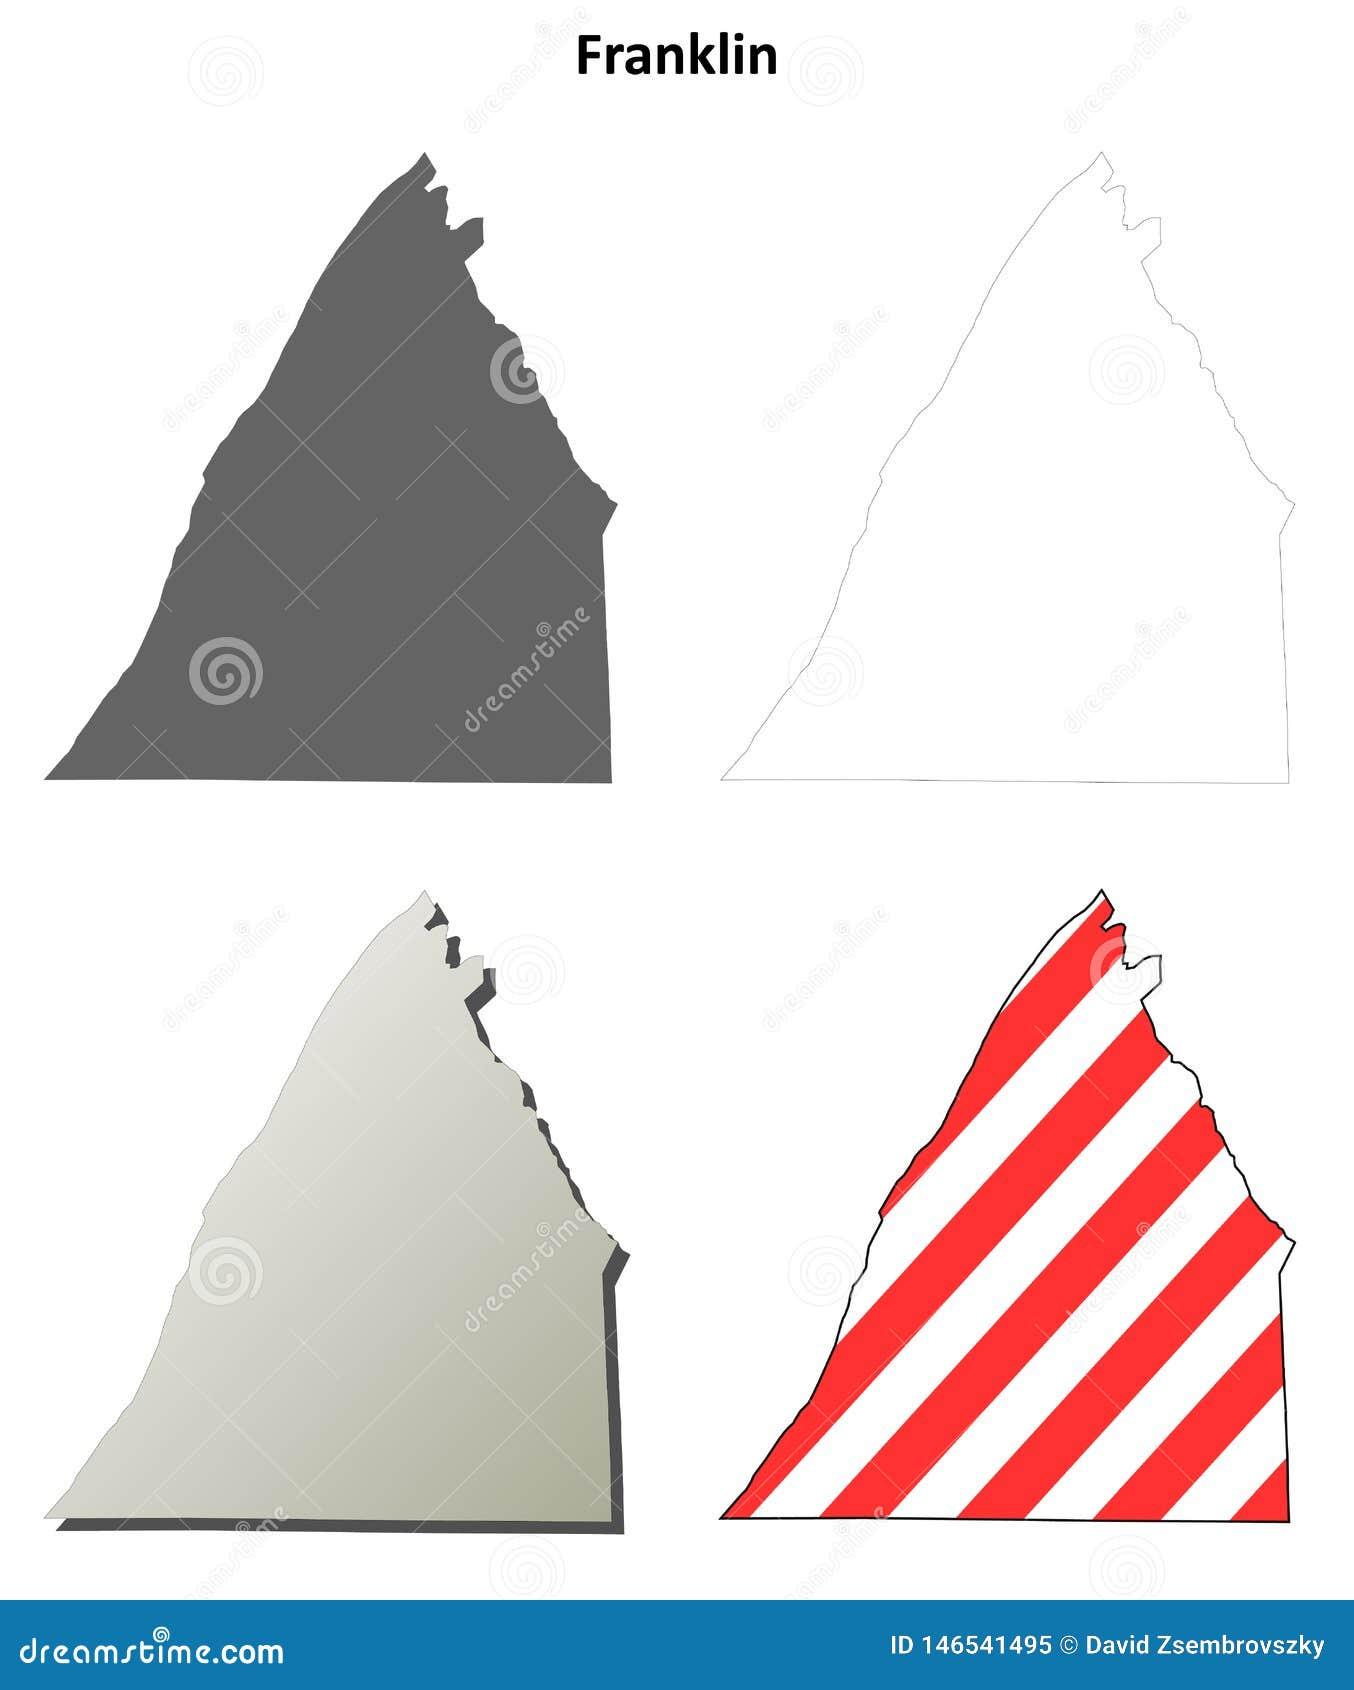 Franklin County, Pennsylvania outline map set